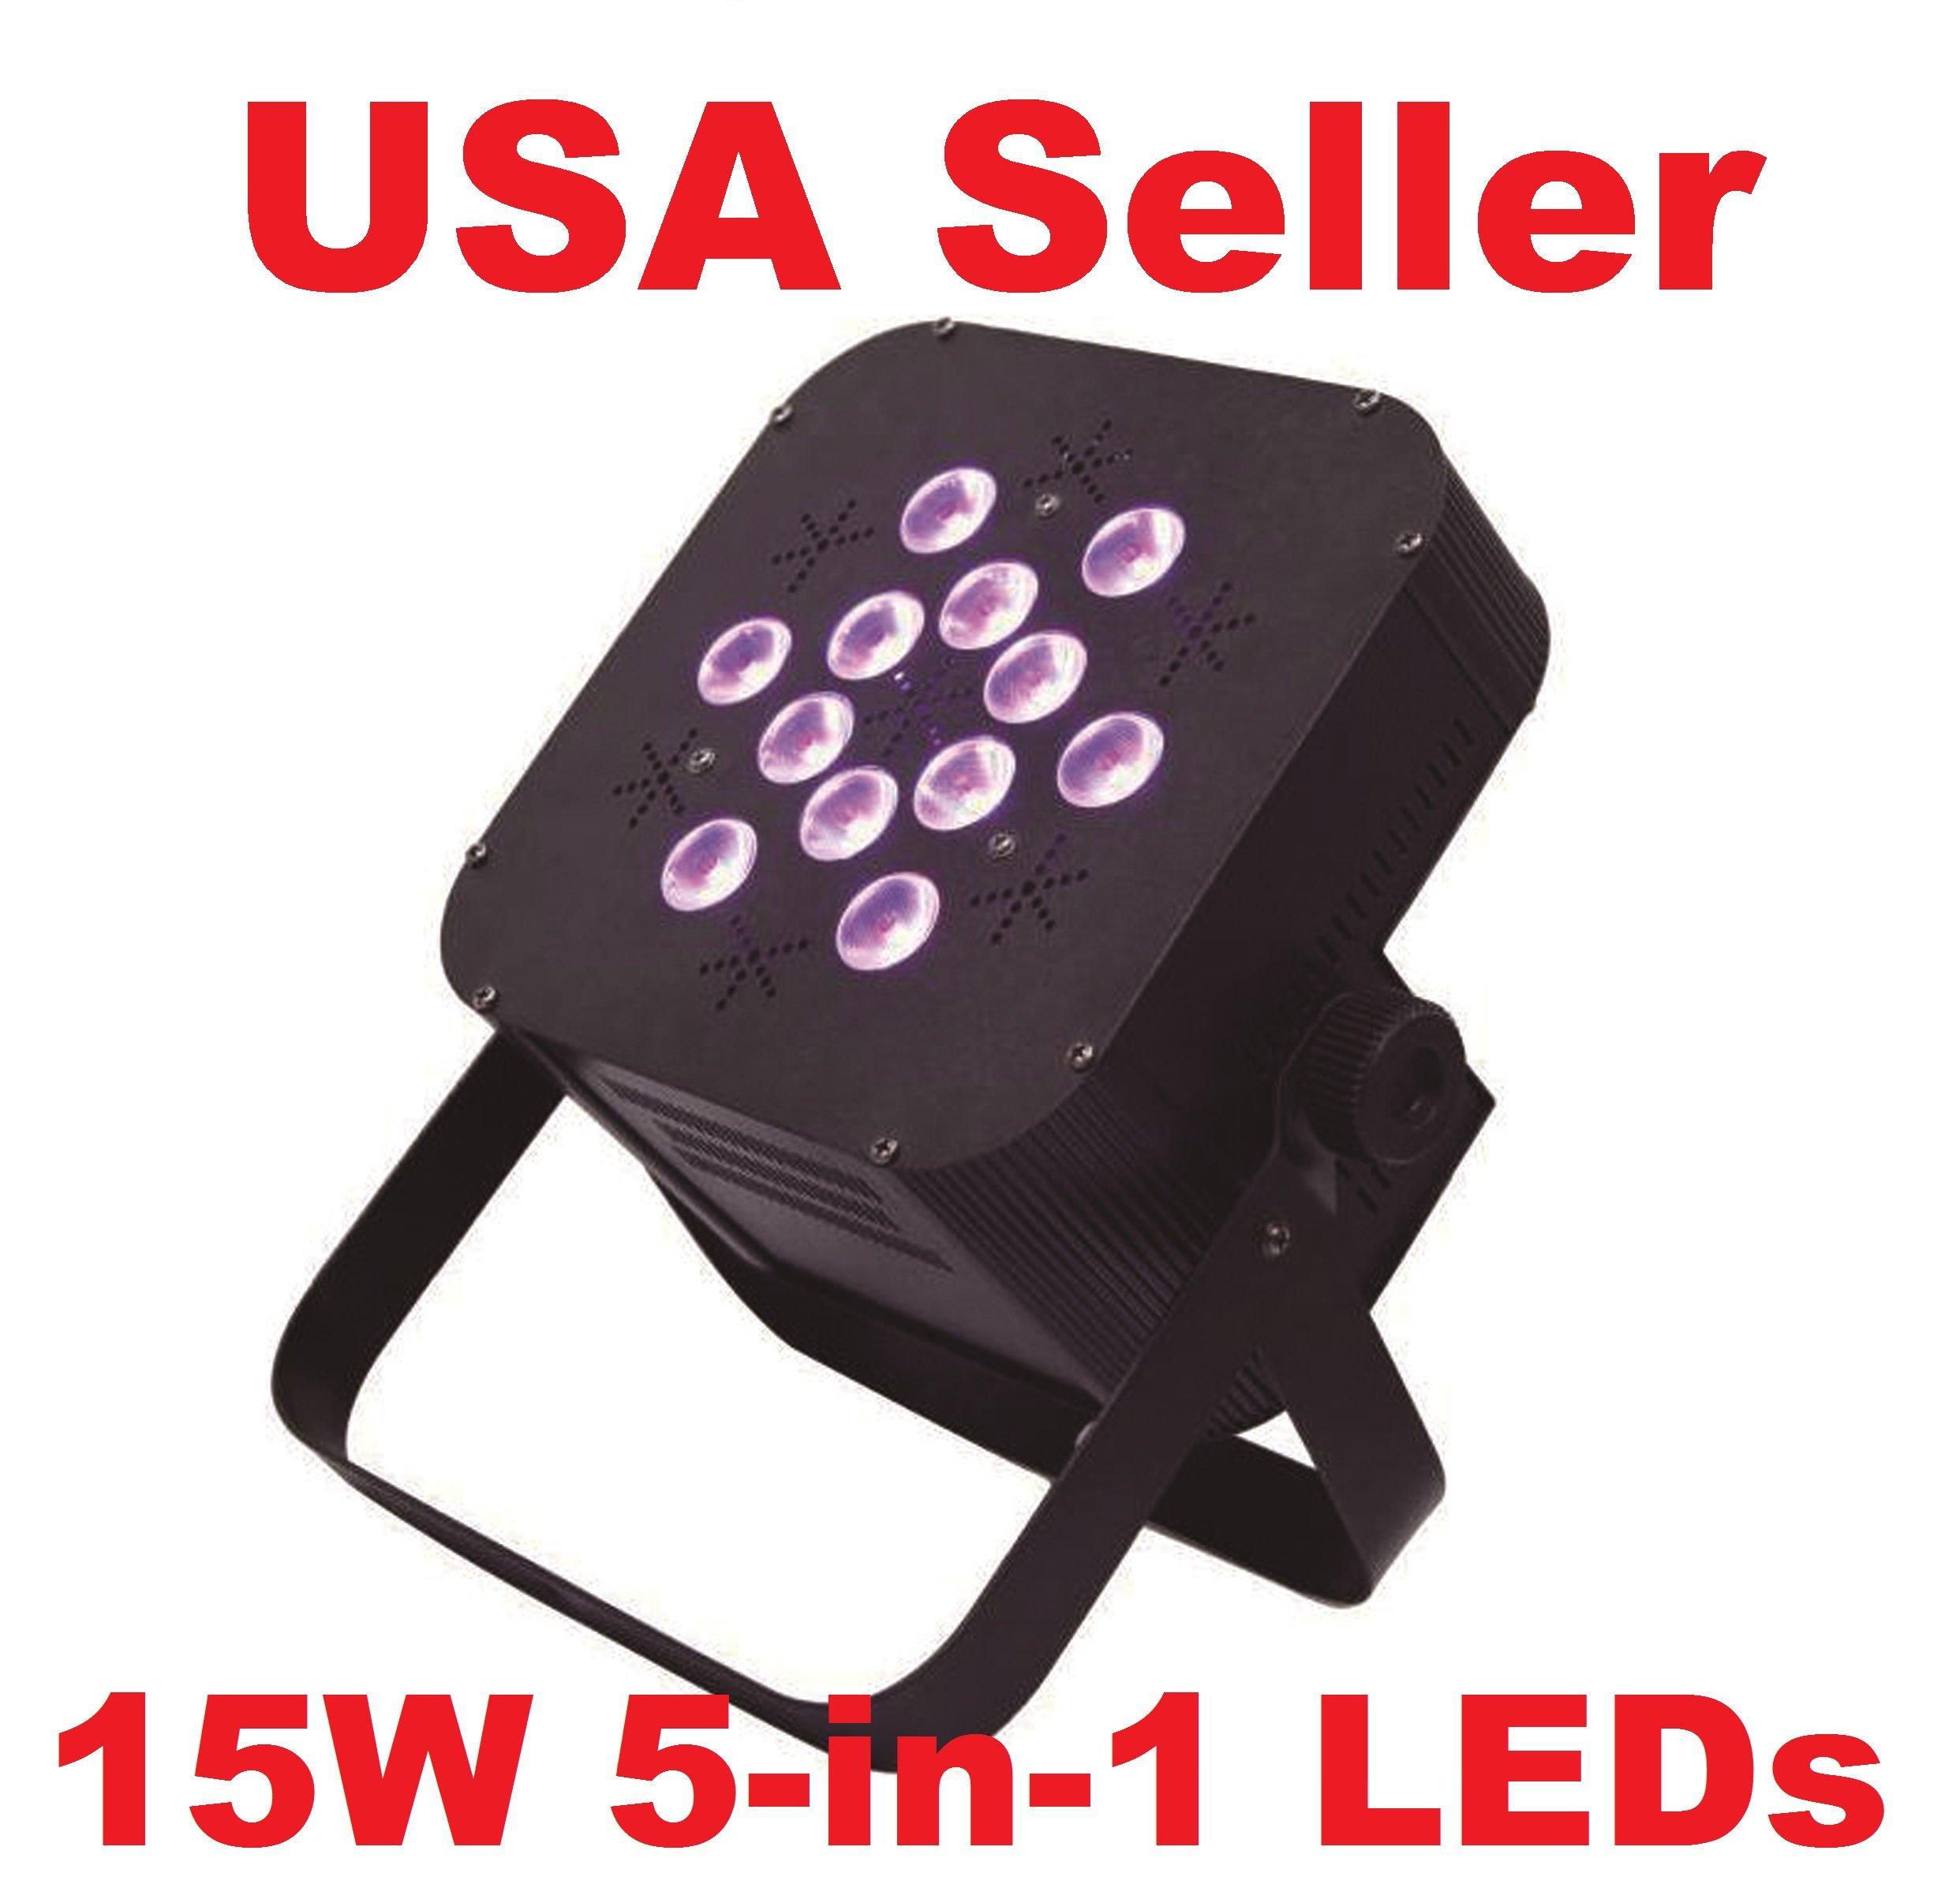 Lumin Lights Slick Par 12x15W 5-in-1 LED RGBAW Par can puck style DMX Light uplighting black housing